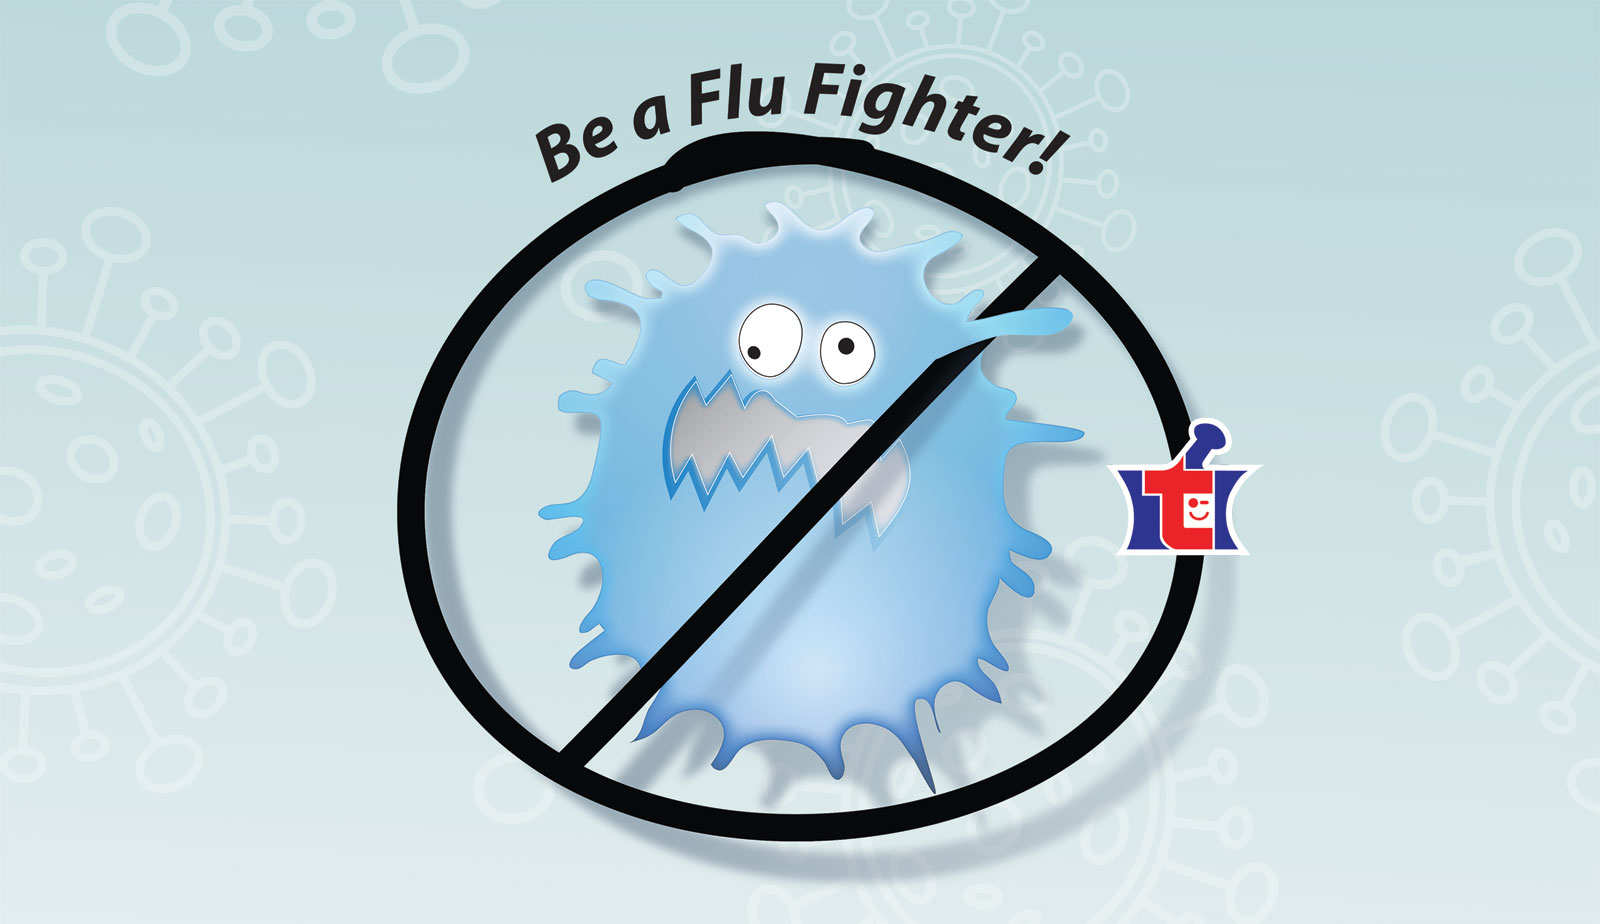 be a flu fighter